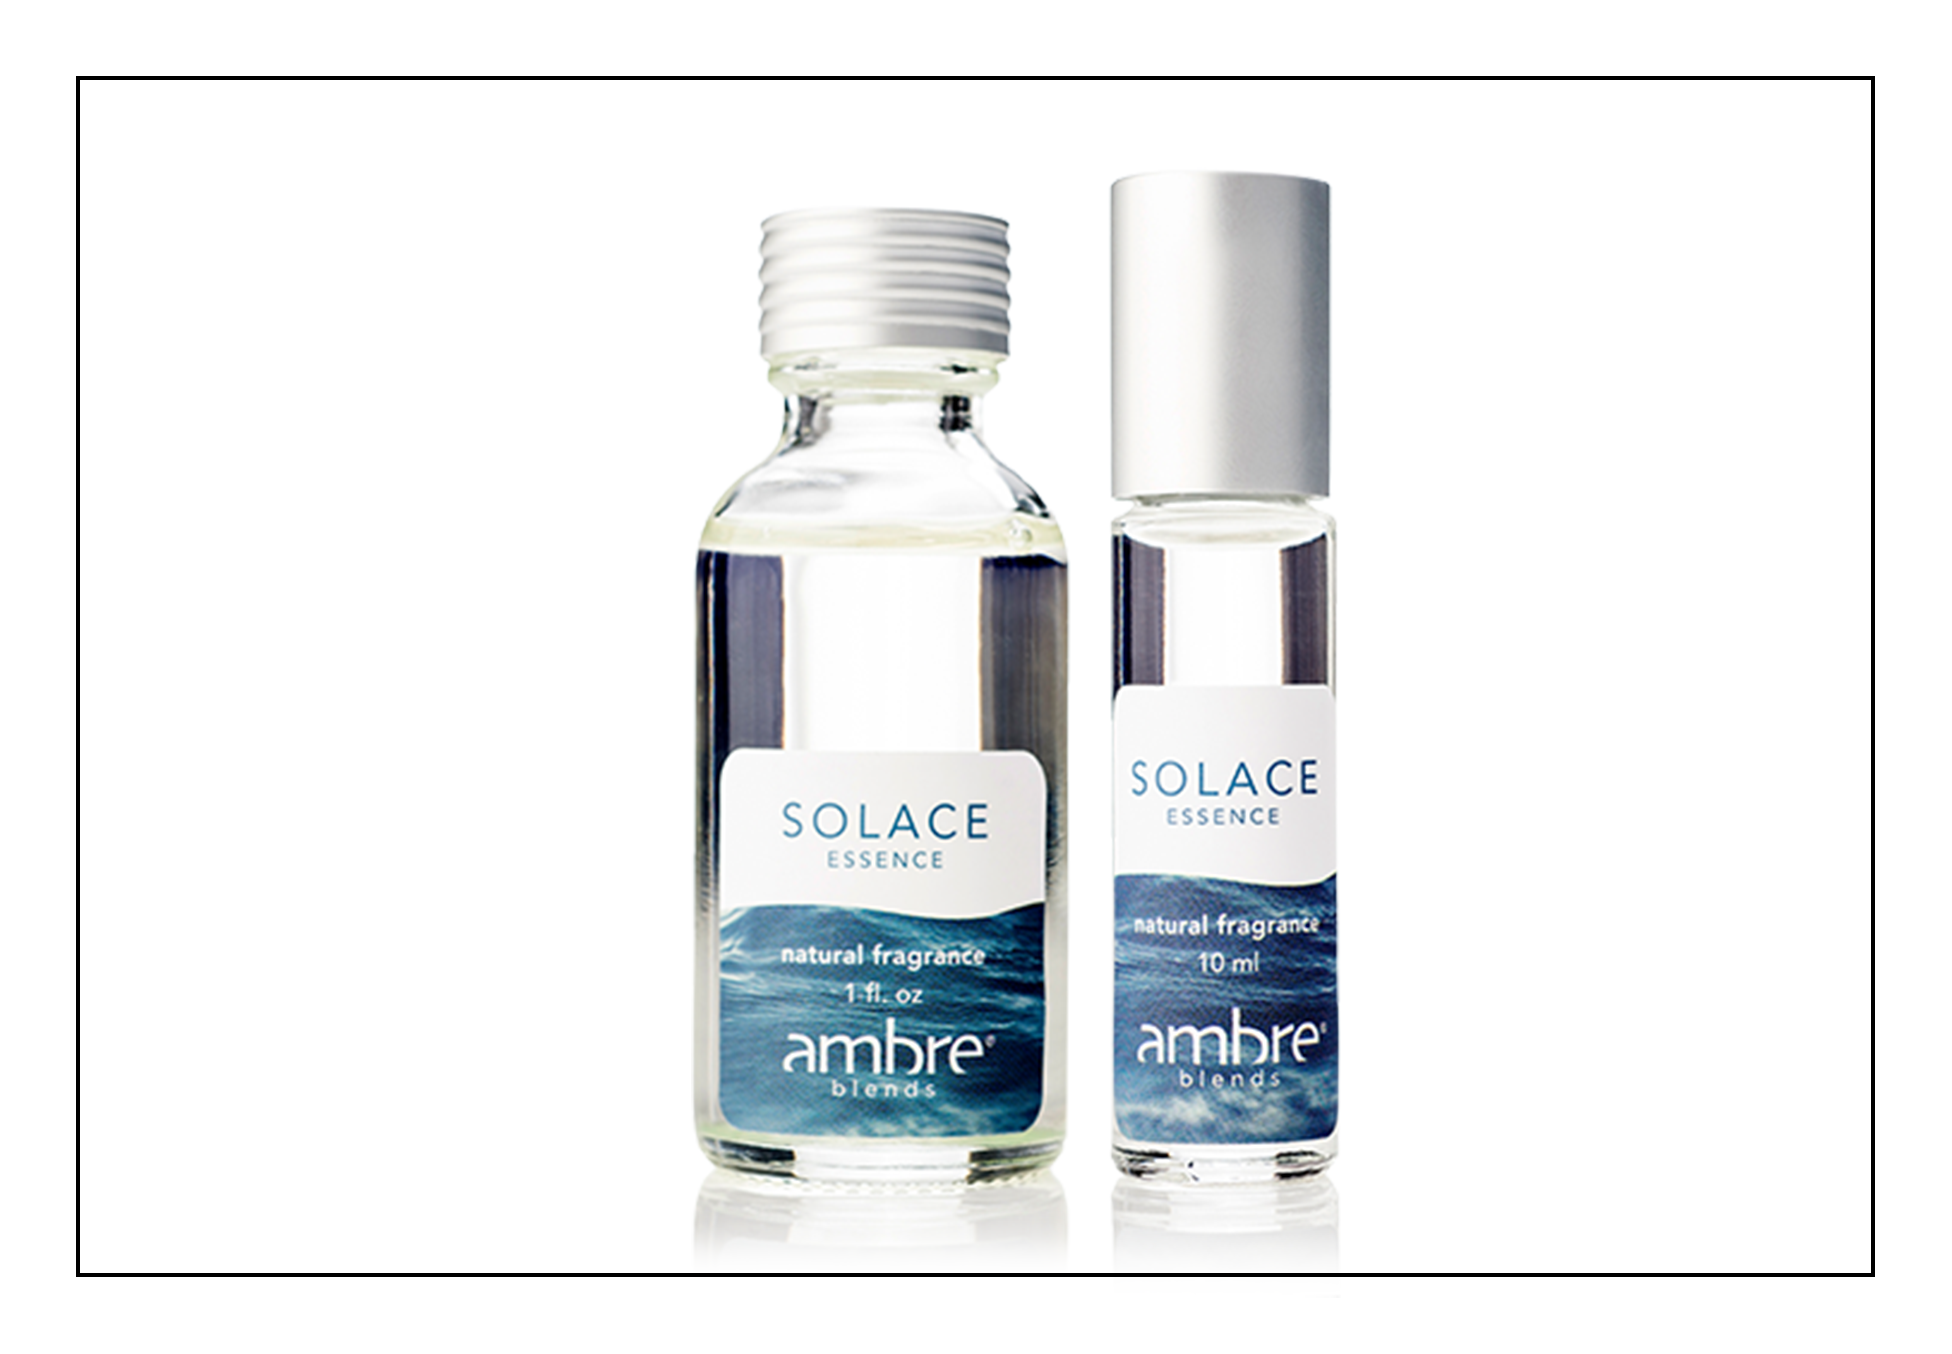 for the girly girl. - natural essential oil fragrance that smells like D&G light blue!